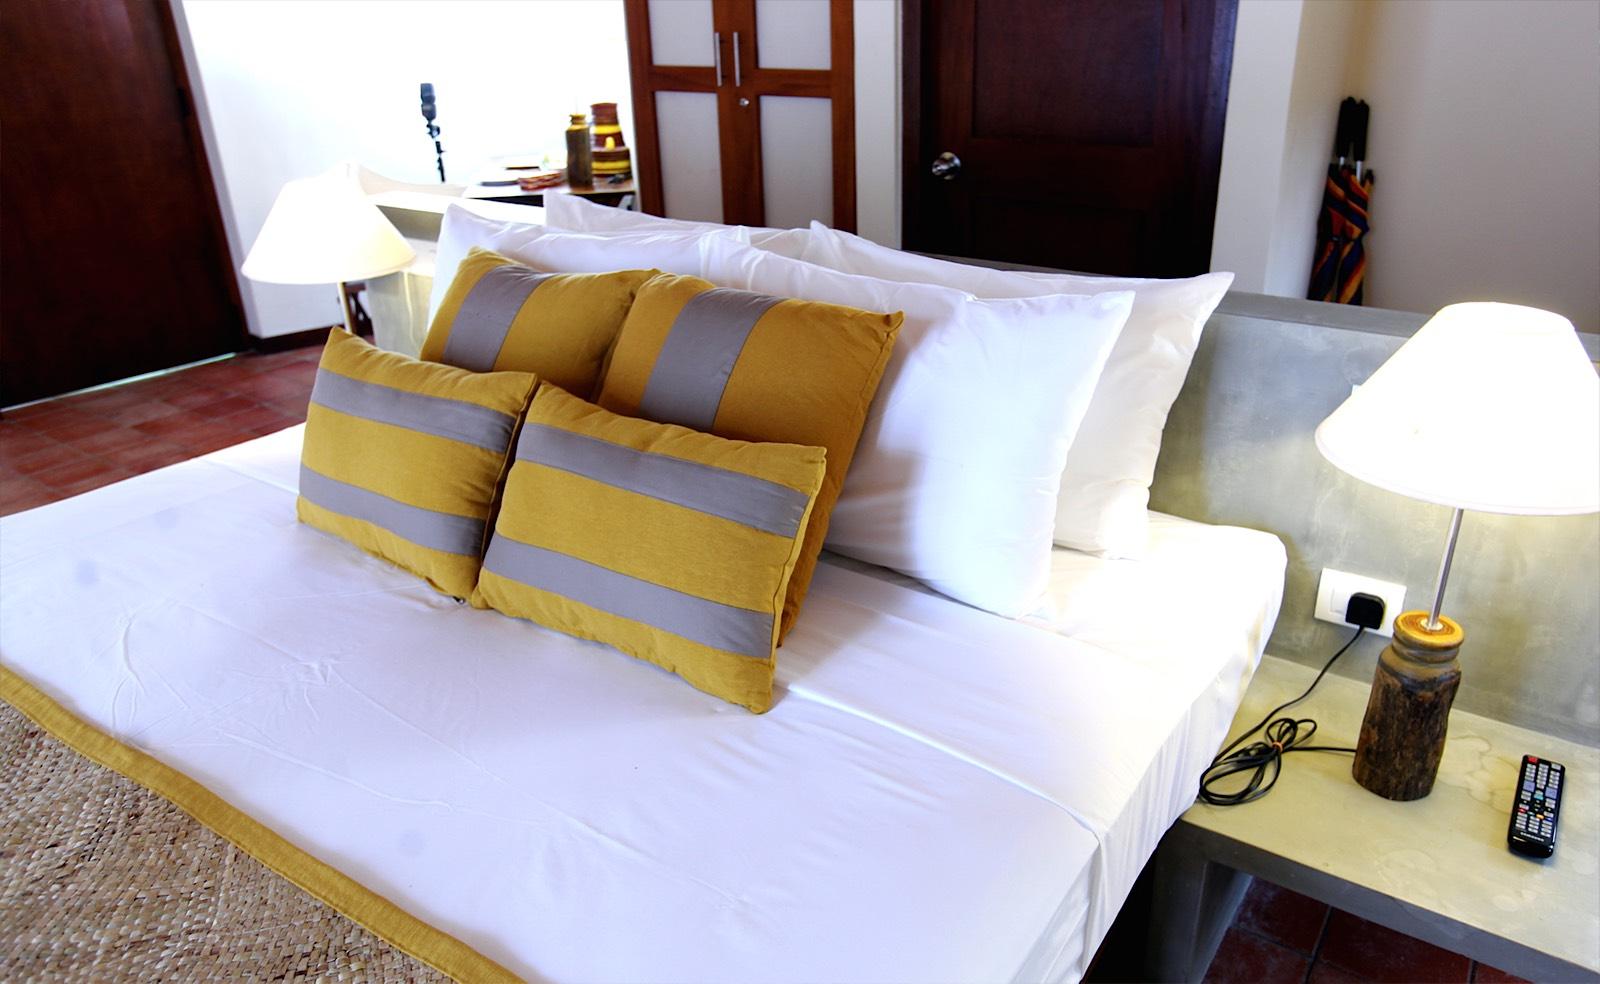 invite-to-paradise-holiday-honeymoon-sri-lanka-specialists-safari-lodge-cinnamon-wild-jungle-chalet-2.jpg